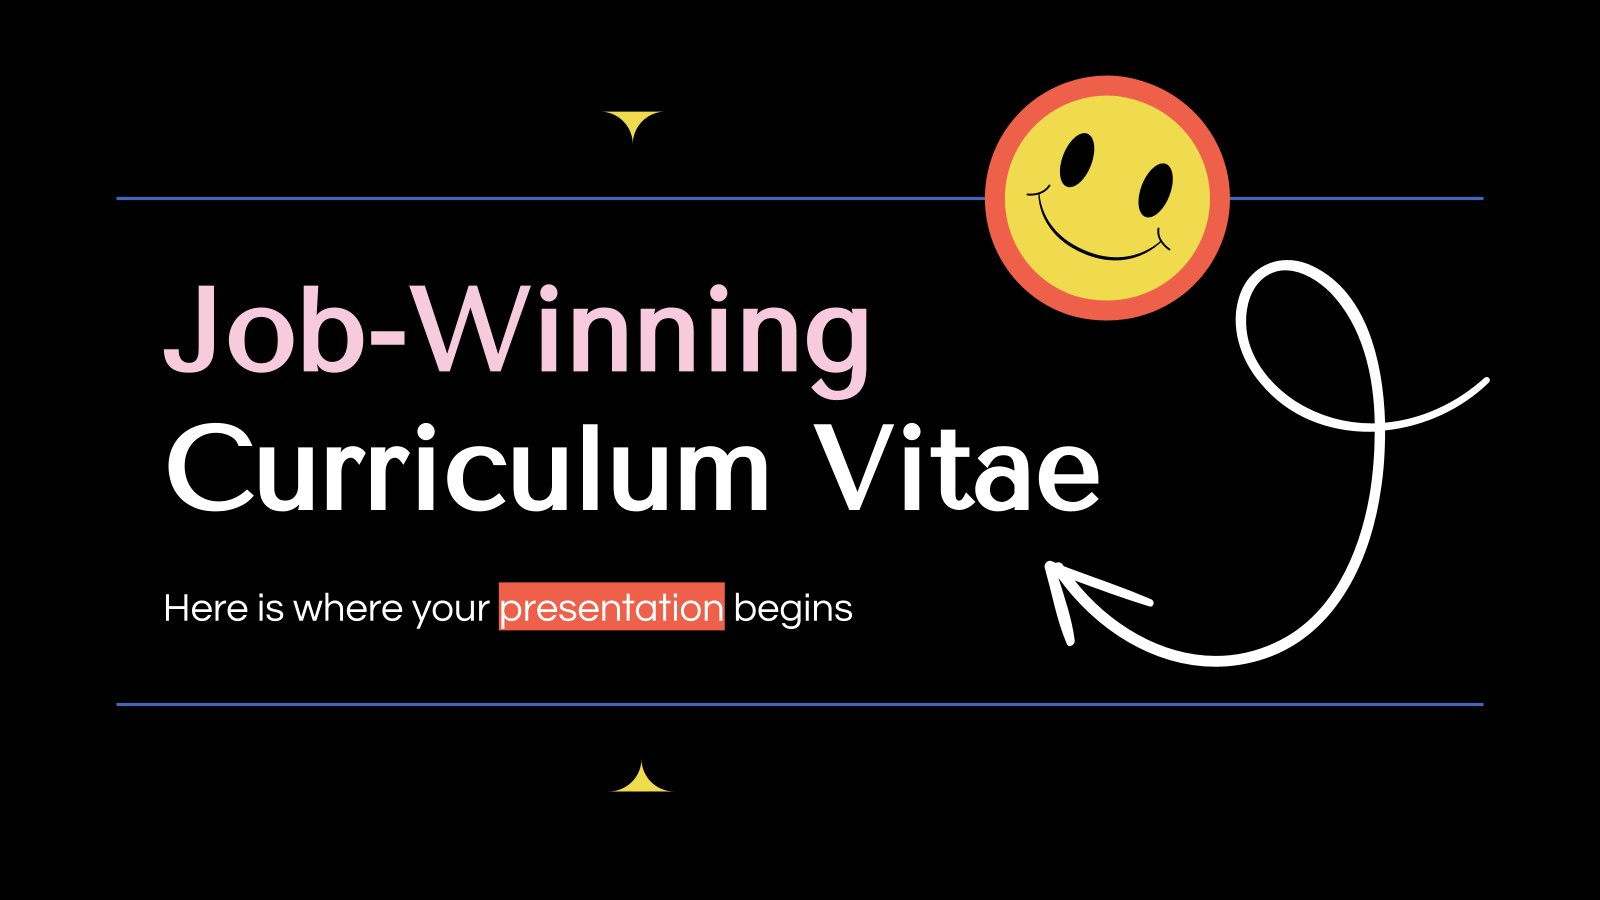 Job-Winning Curriculum Vitae presentation template